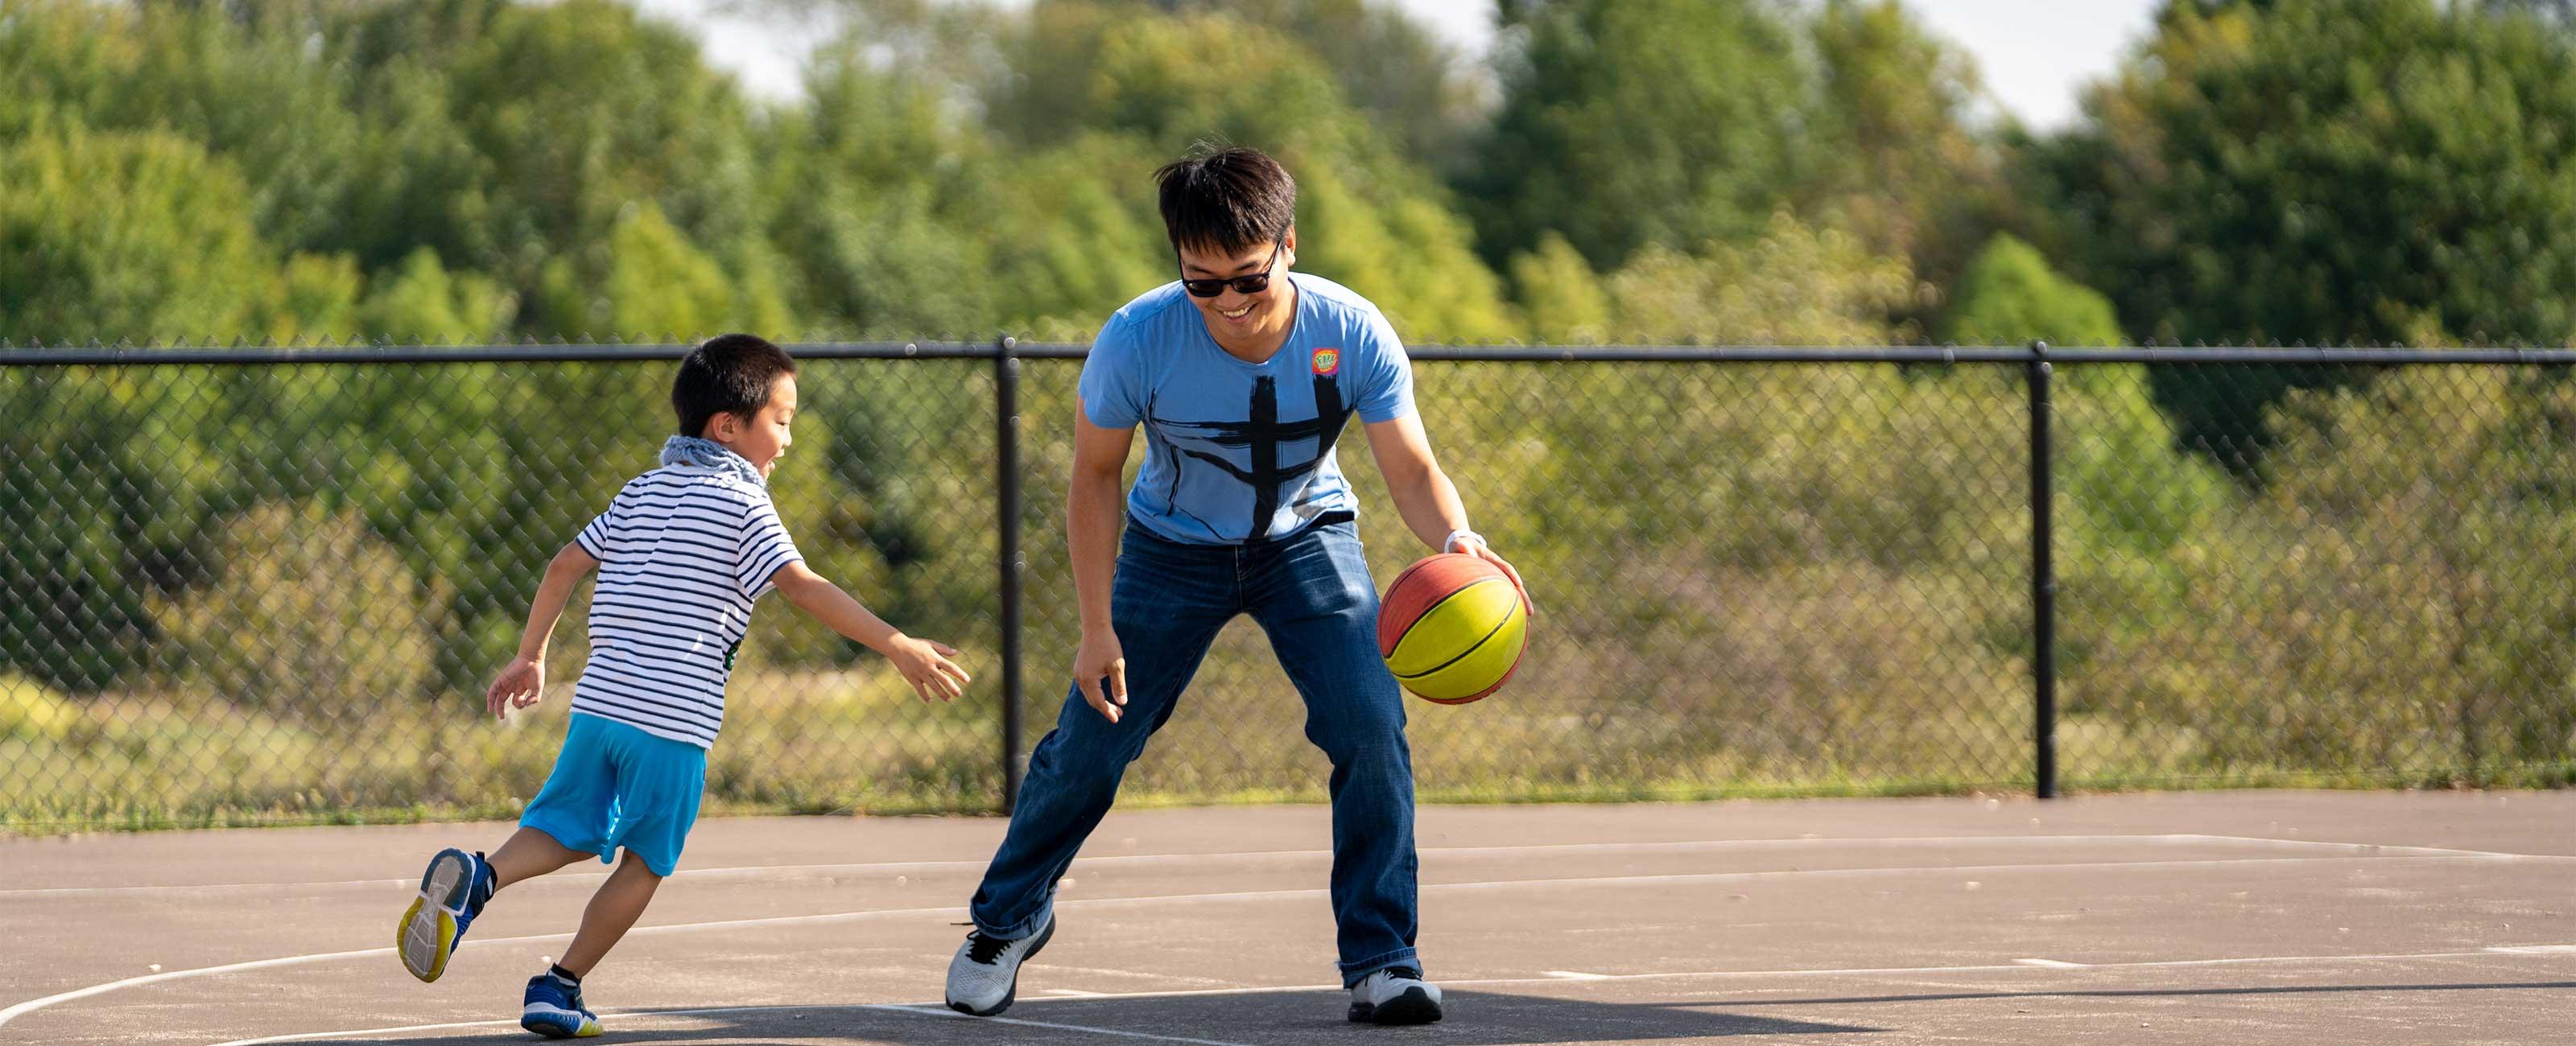 x嵌入故事袁诗和儿子一起打篮球照片